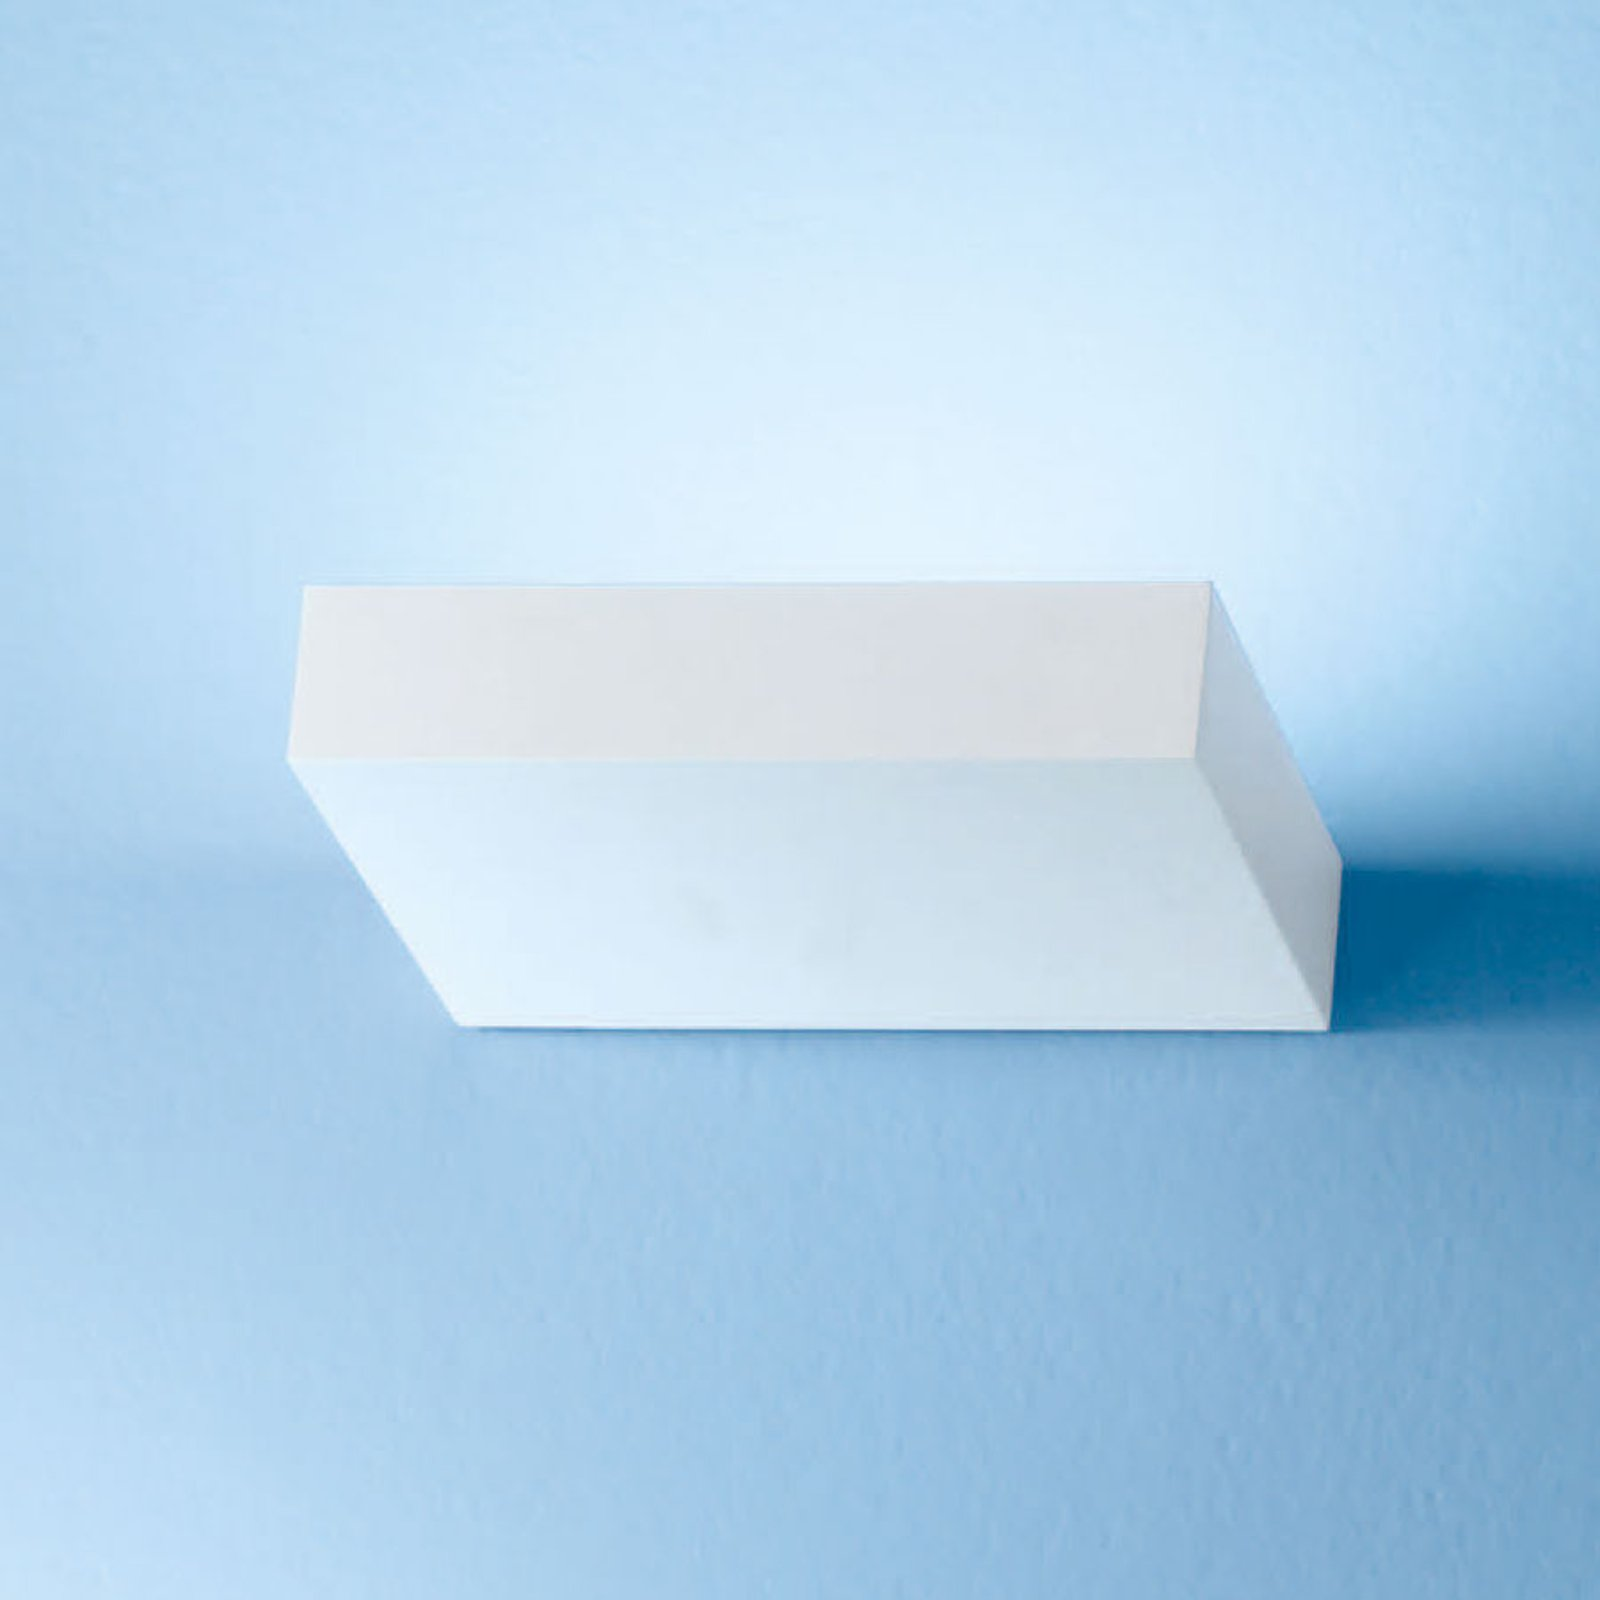 Regolo LED-vegglampe, lengde 16,3 cm, hvit